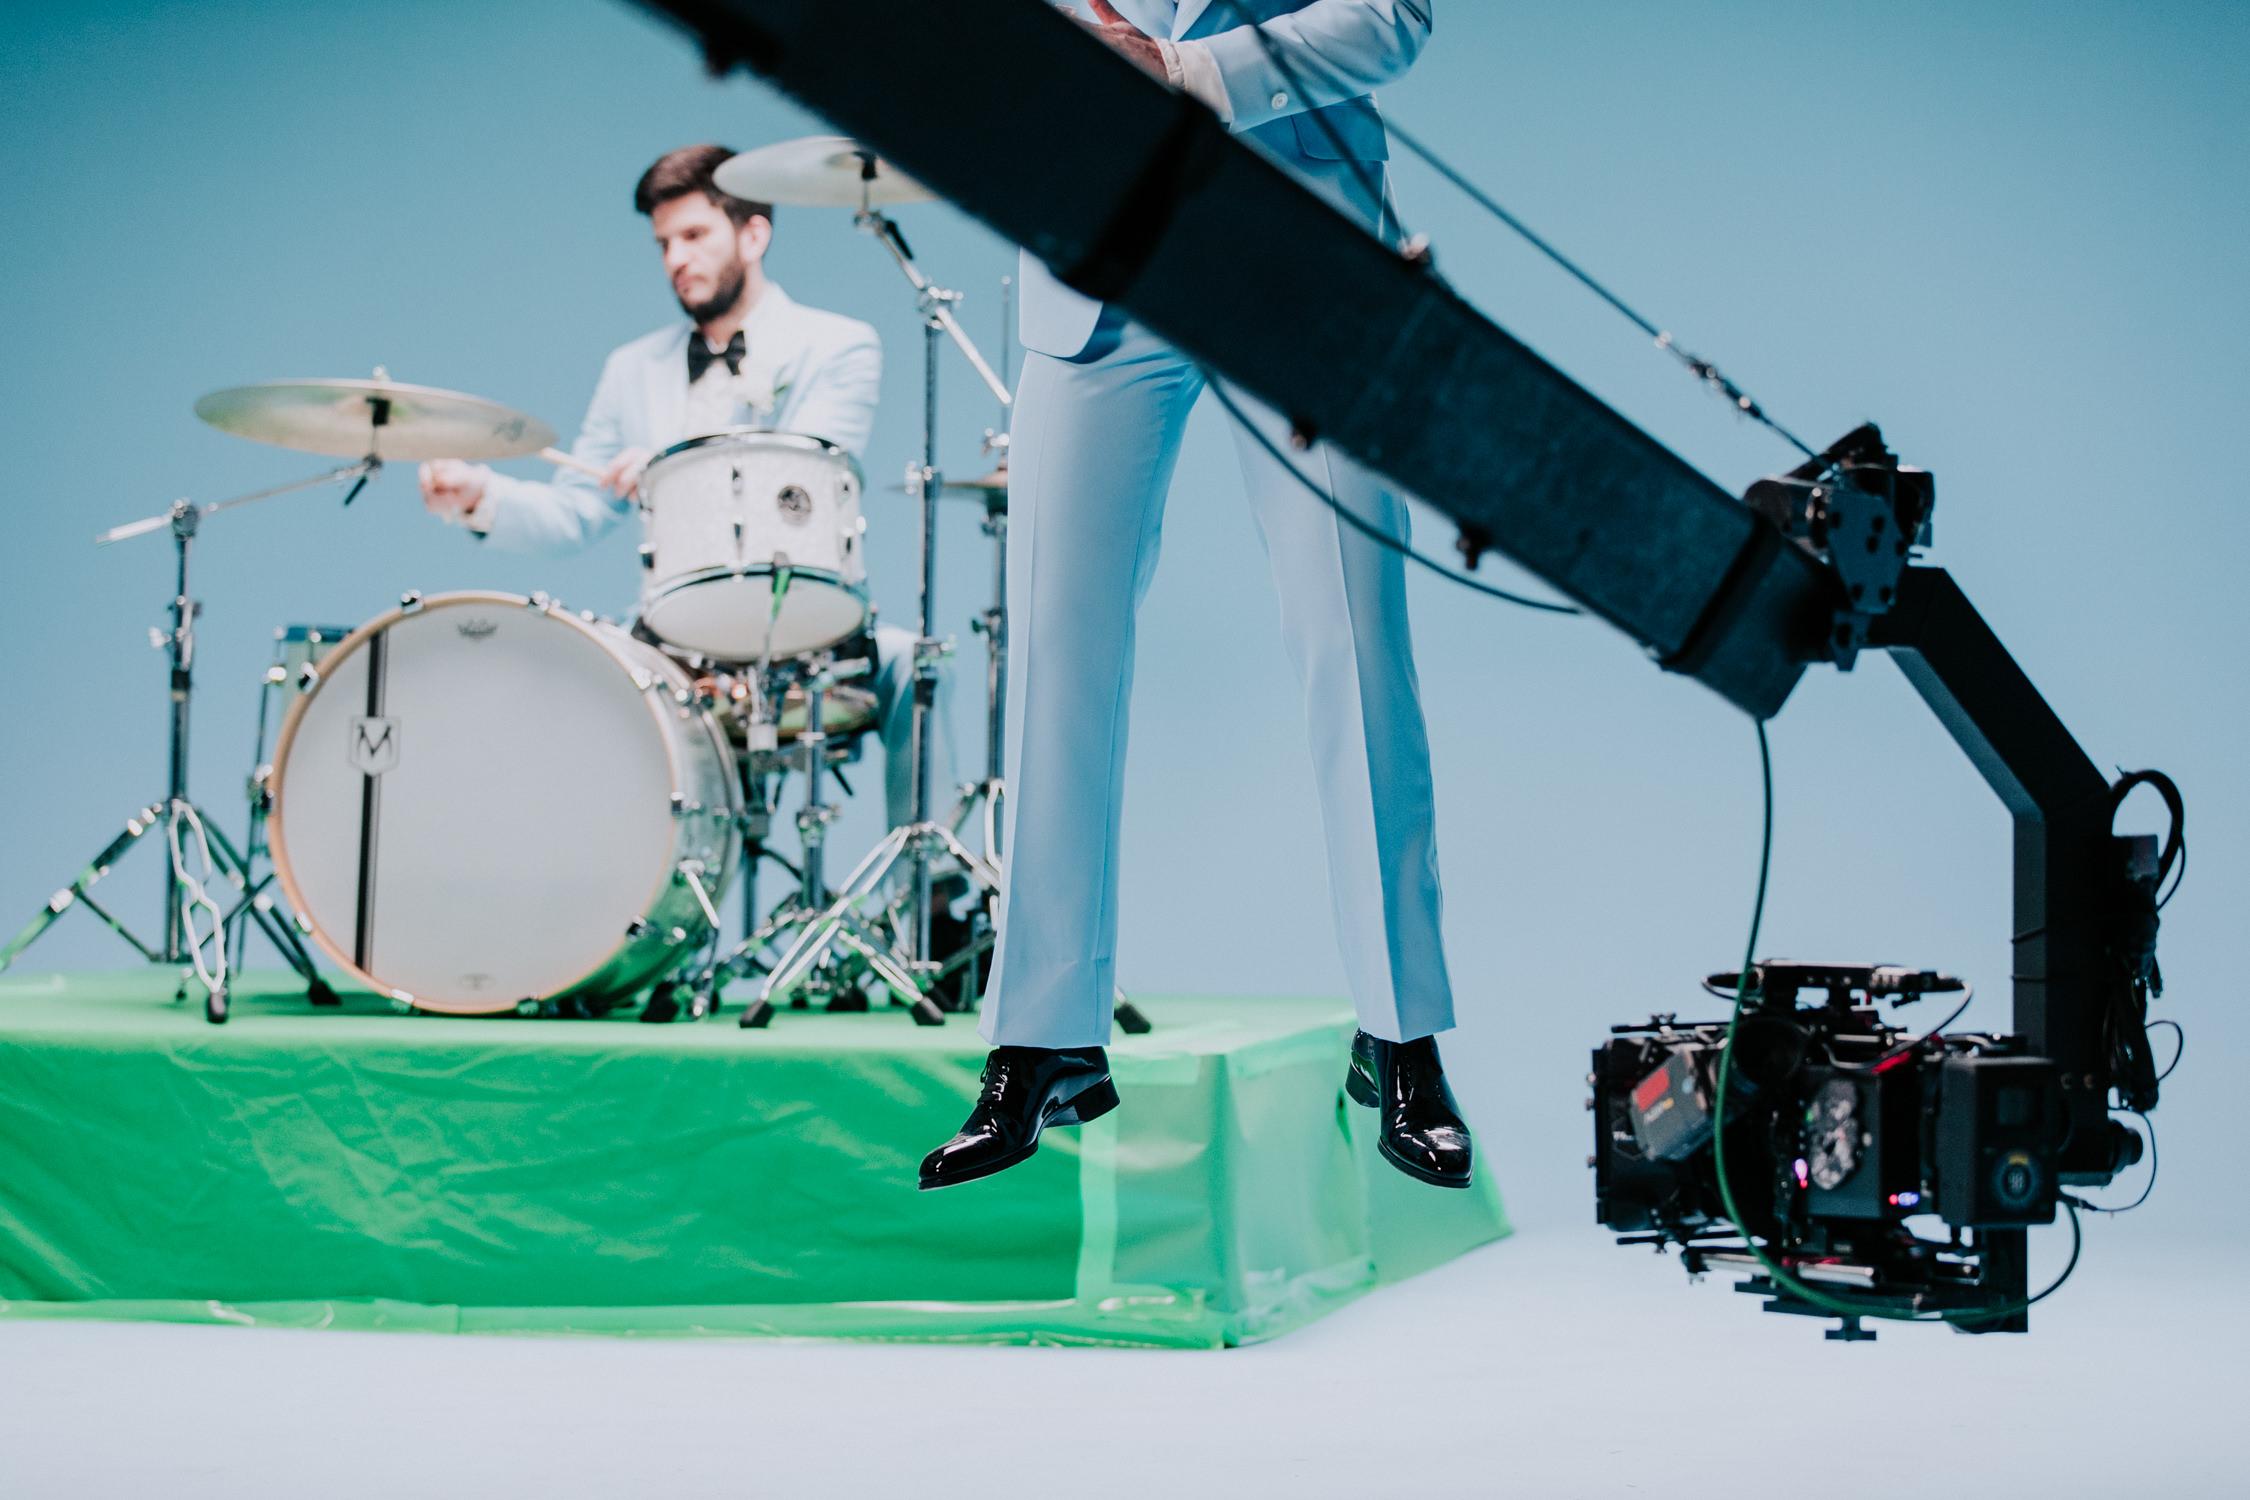 music-video-floating-feet-camera-crane-rig-bts-AnnaLeeMedia